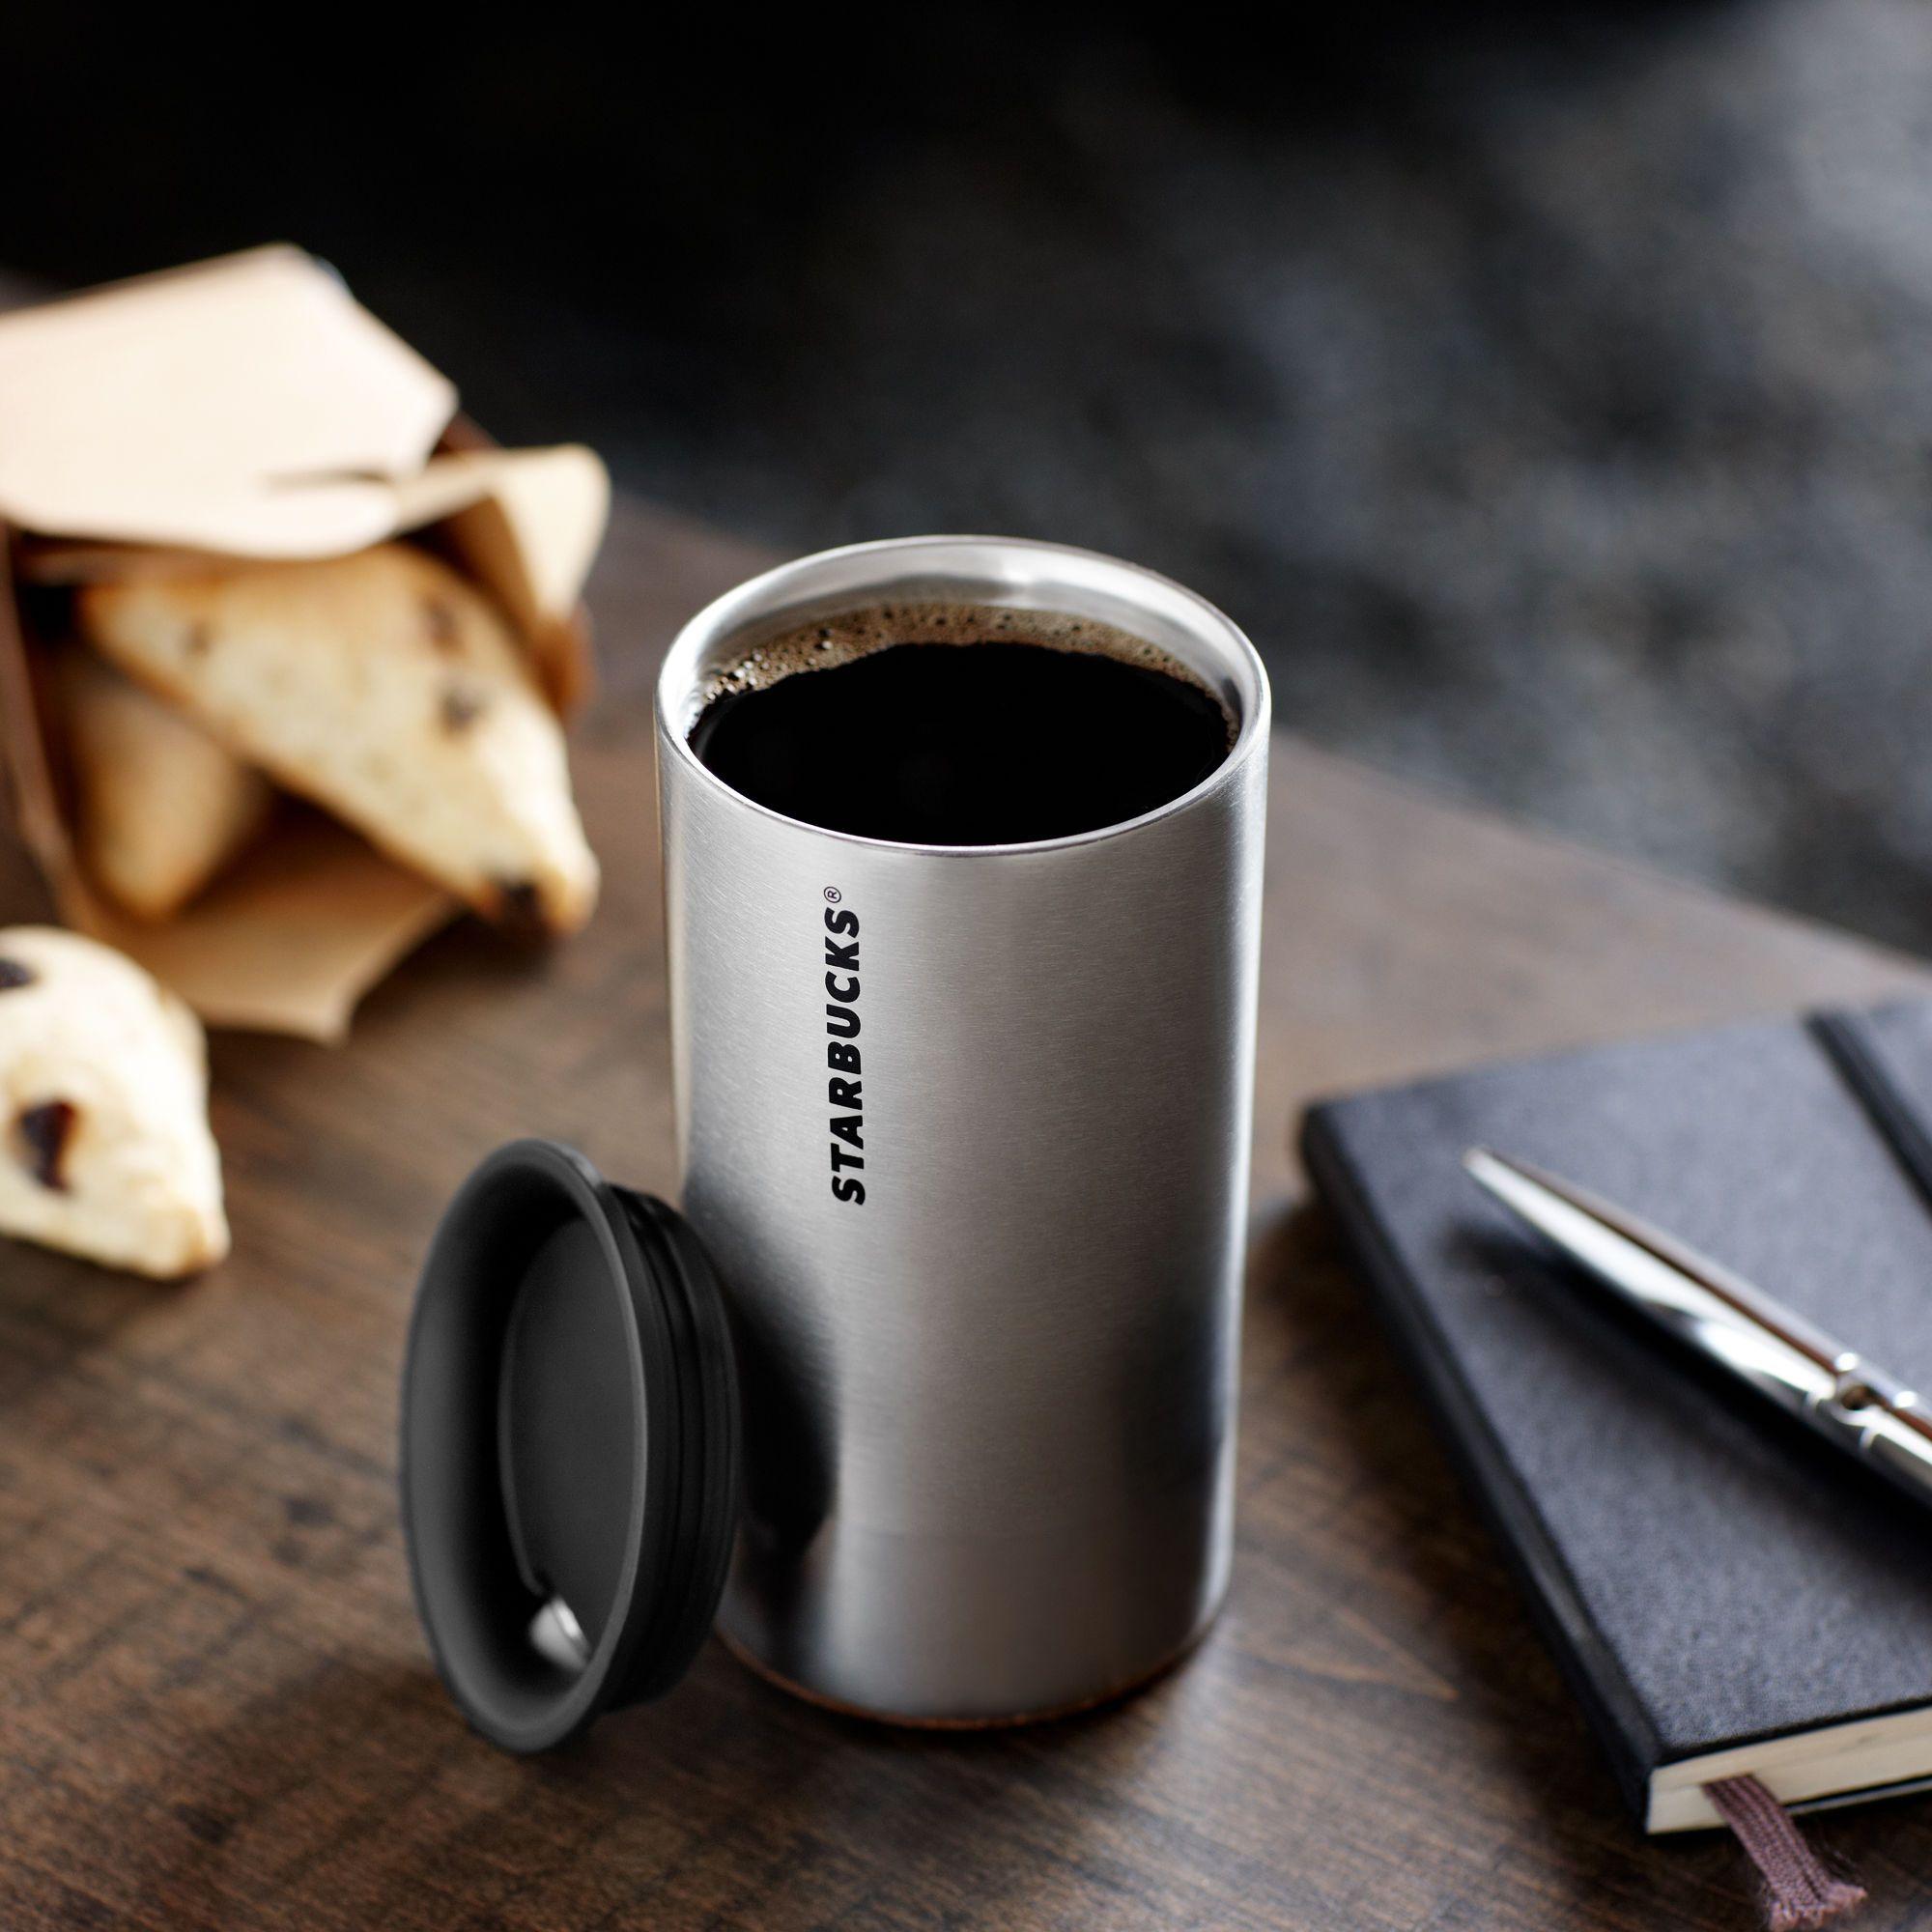 Starbucks® Stainless Steel Travel Mug Coffee tumbler